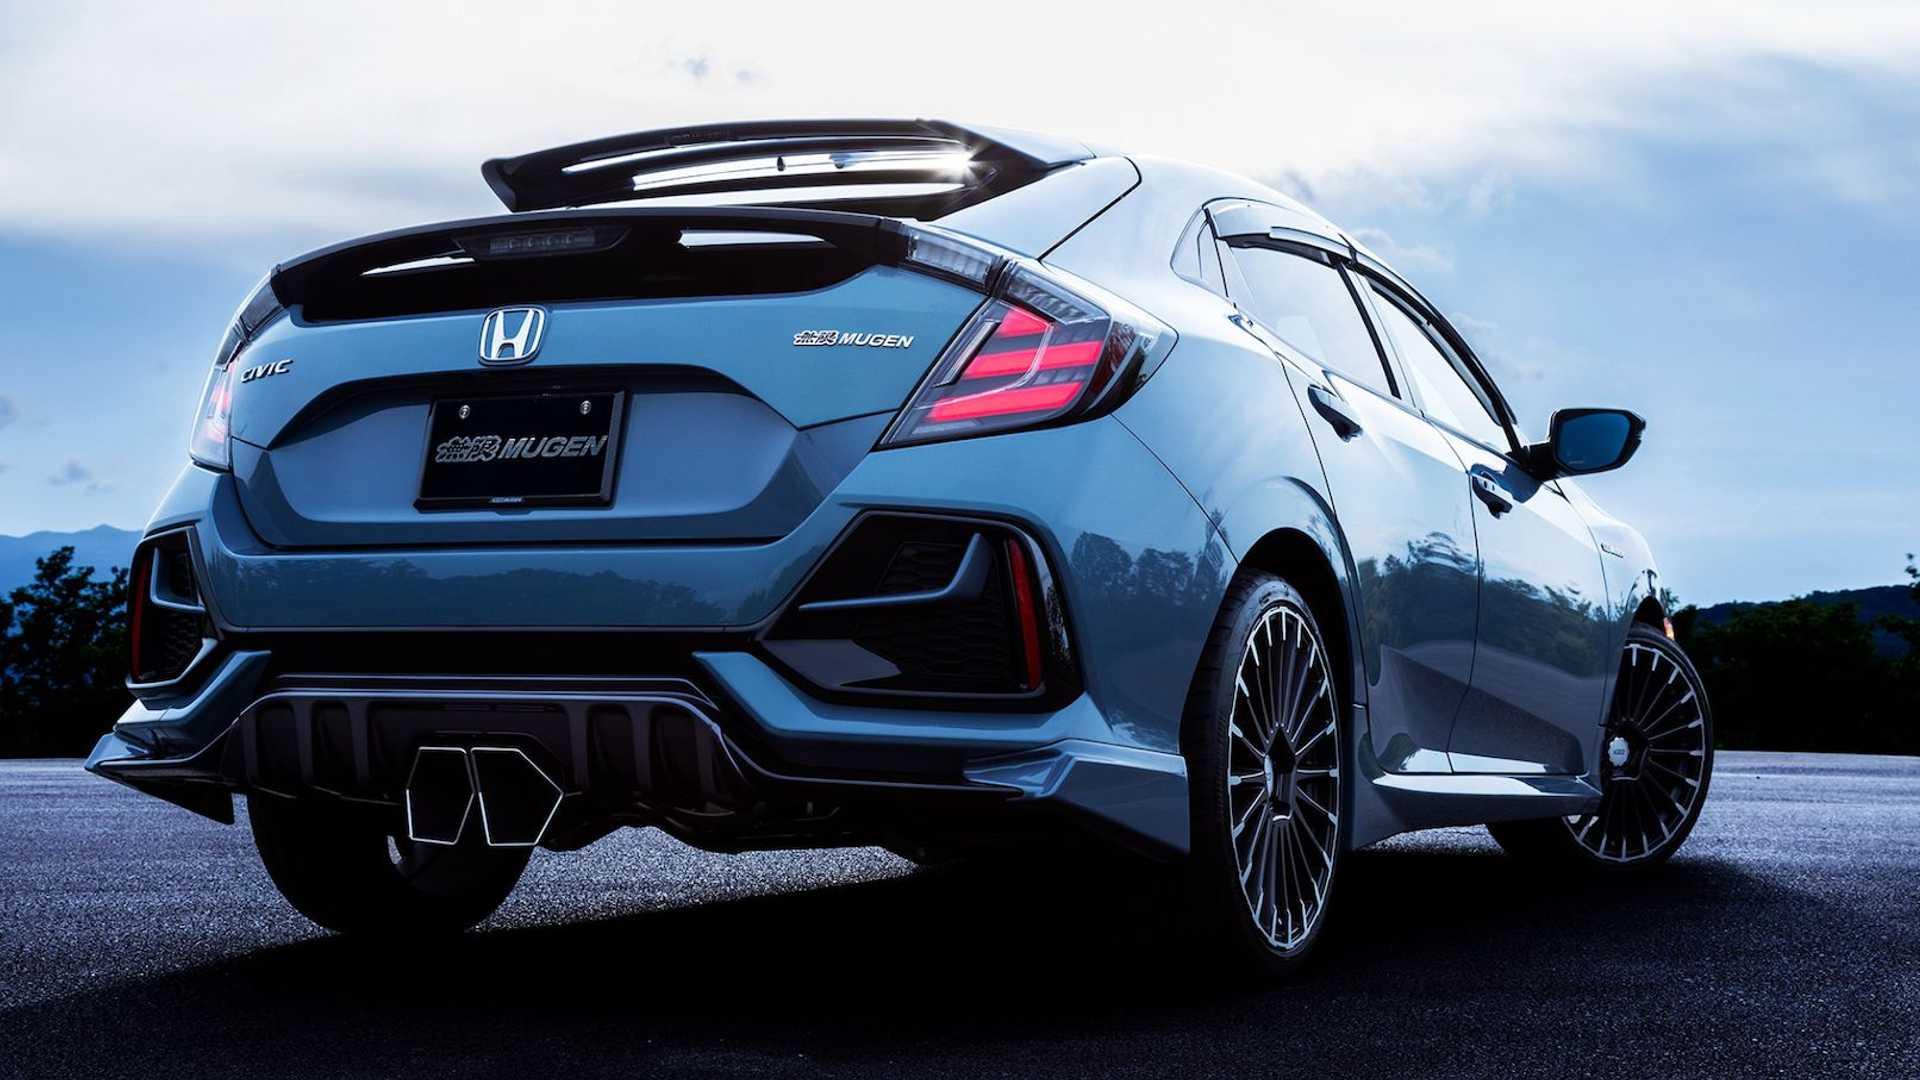 honda-civic-hatchback-mugen---rear-beauty-high-contrast